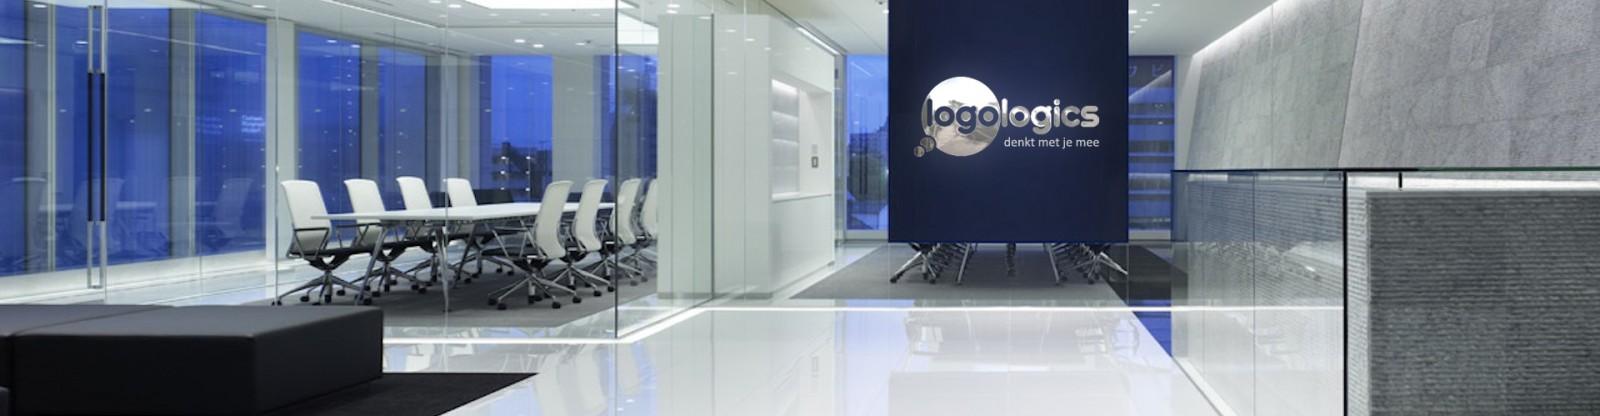 Home-office-met-strak-logo